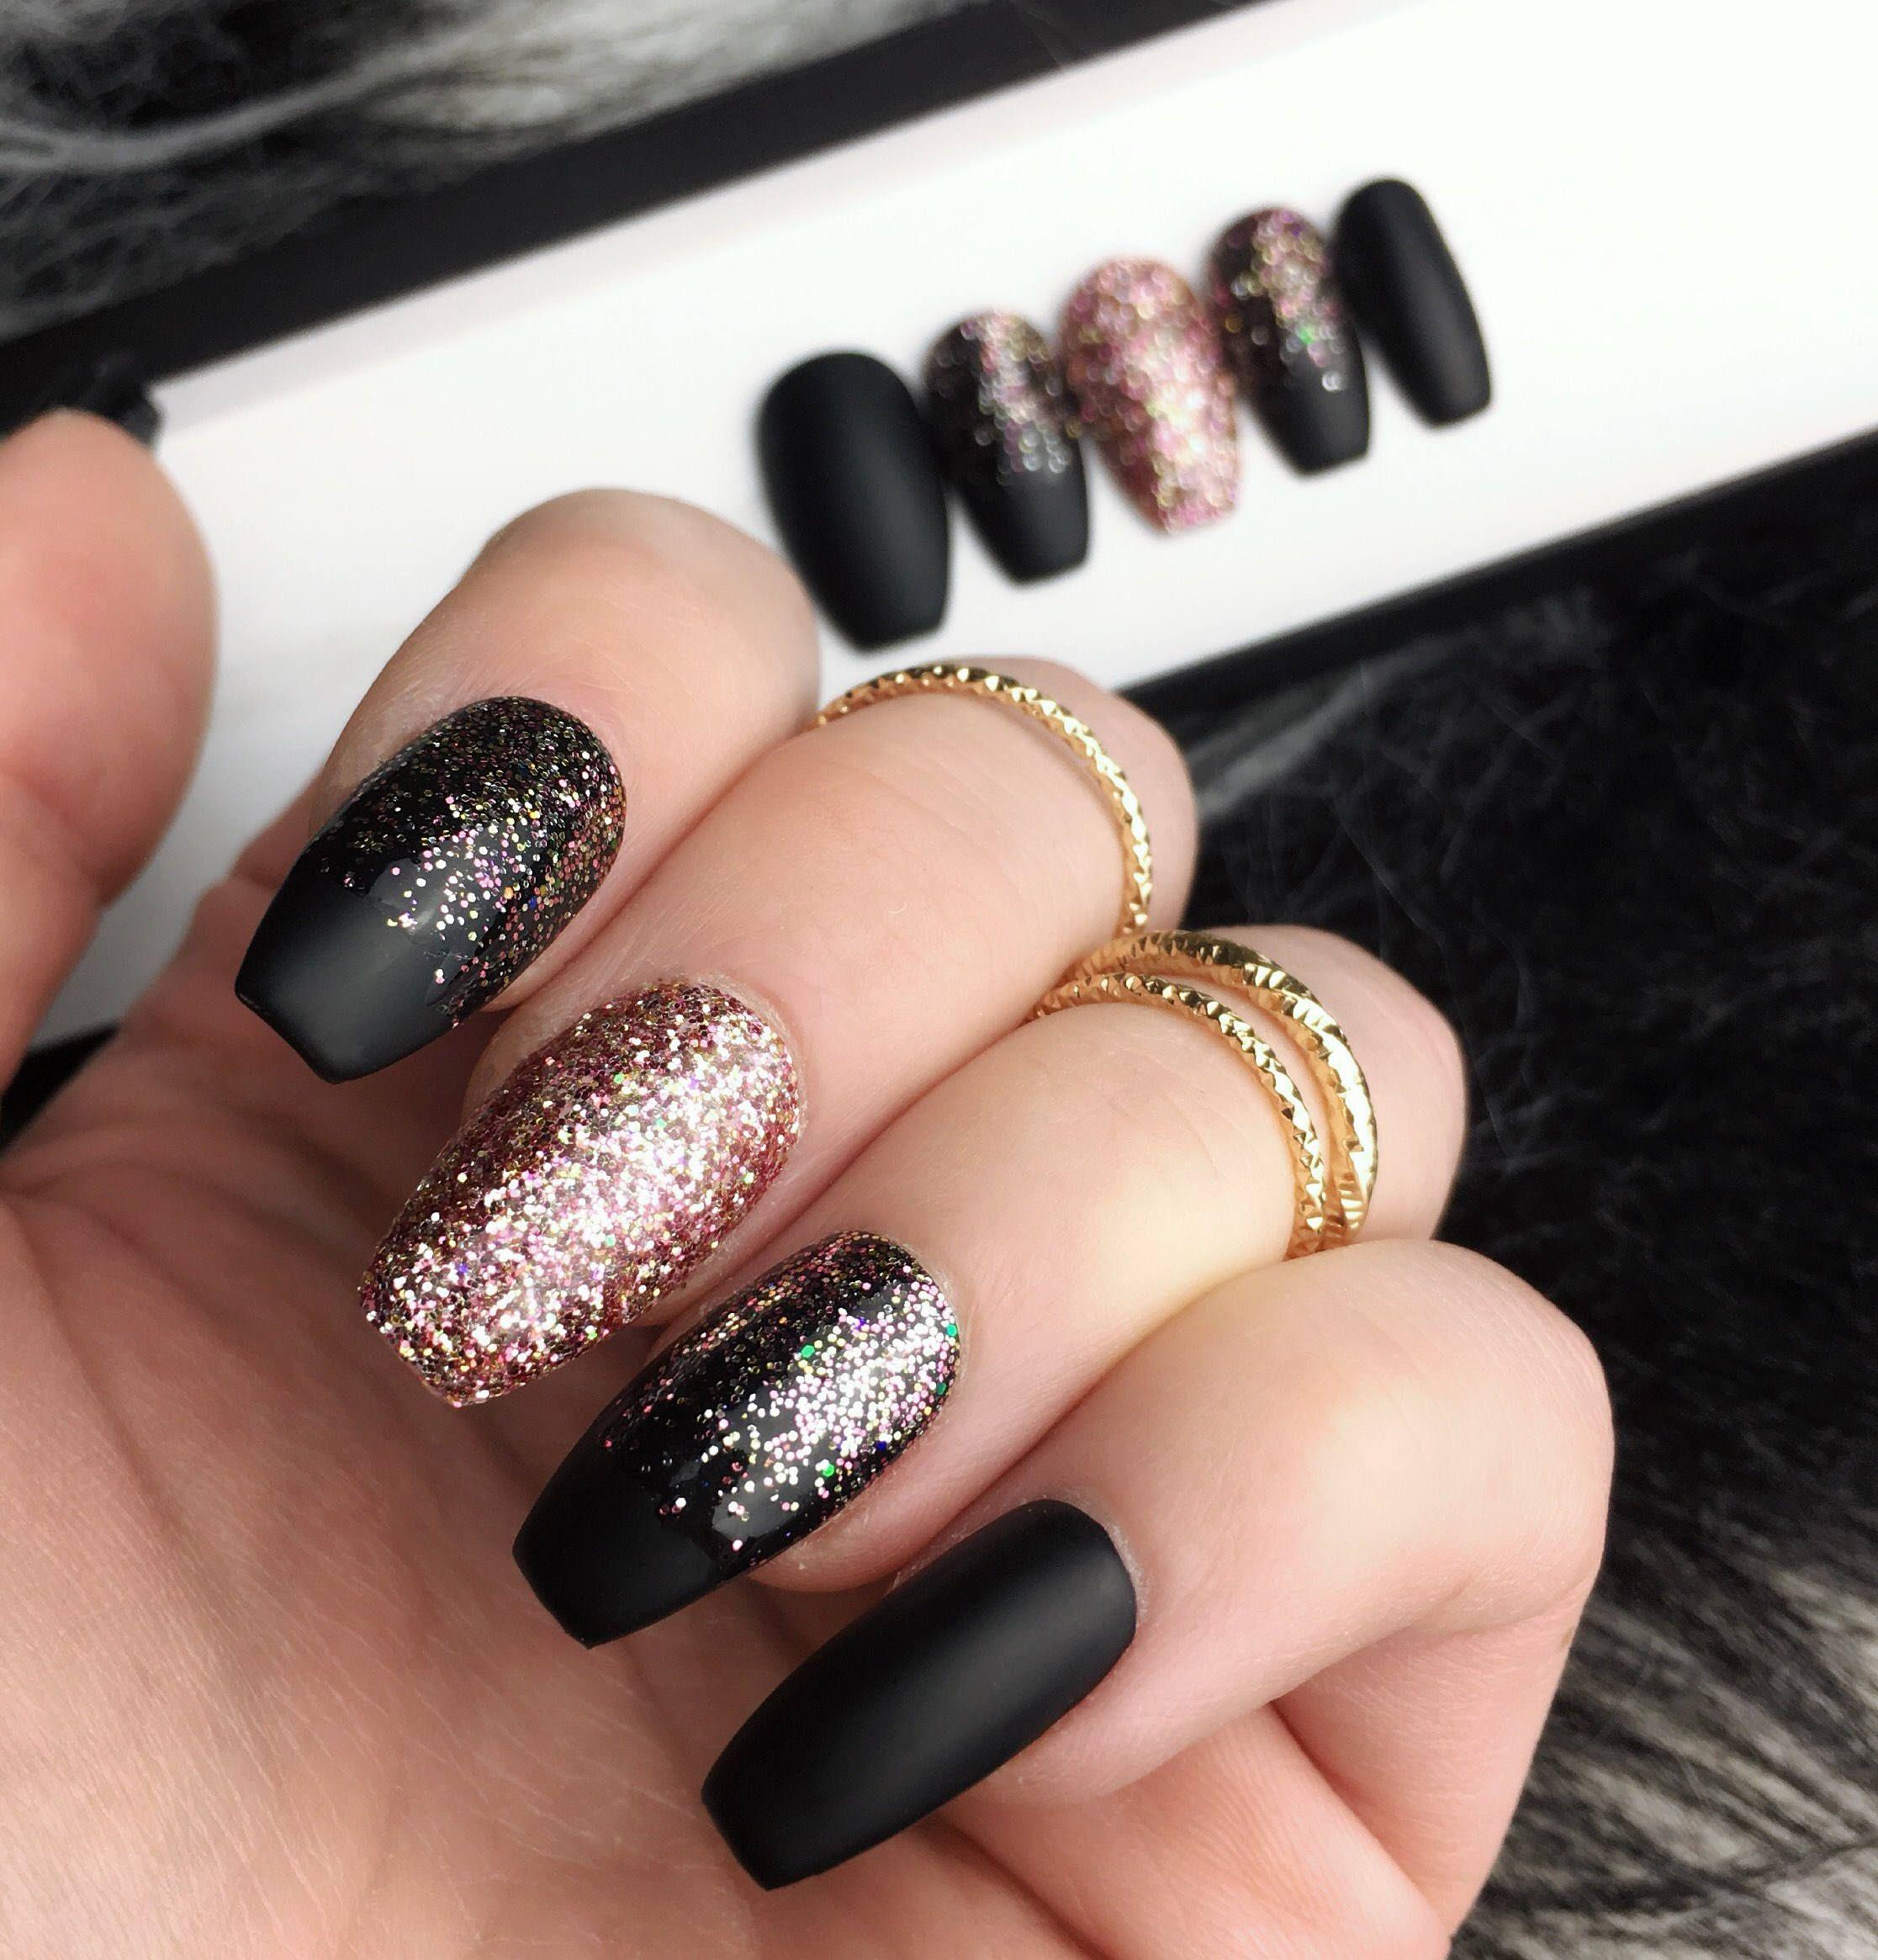 Black Rosegold Glitter Nails Gold Glitter Nails Rose Gold Nails Black Nail Designs